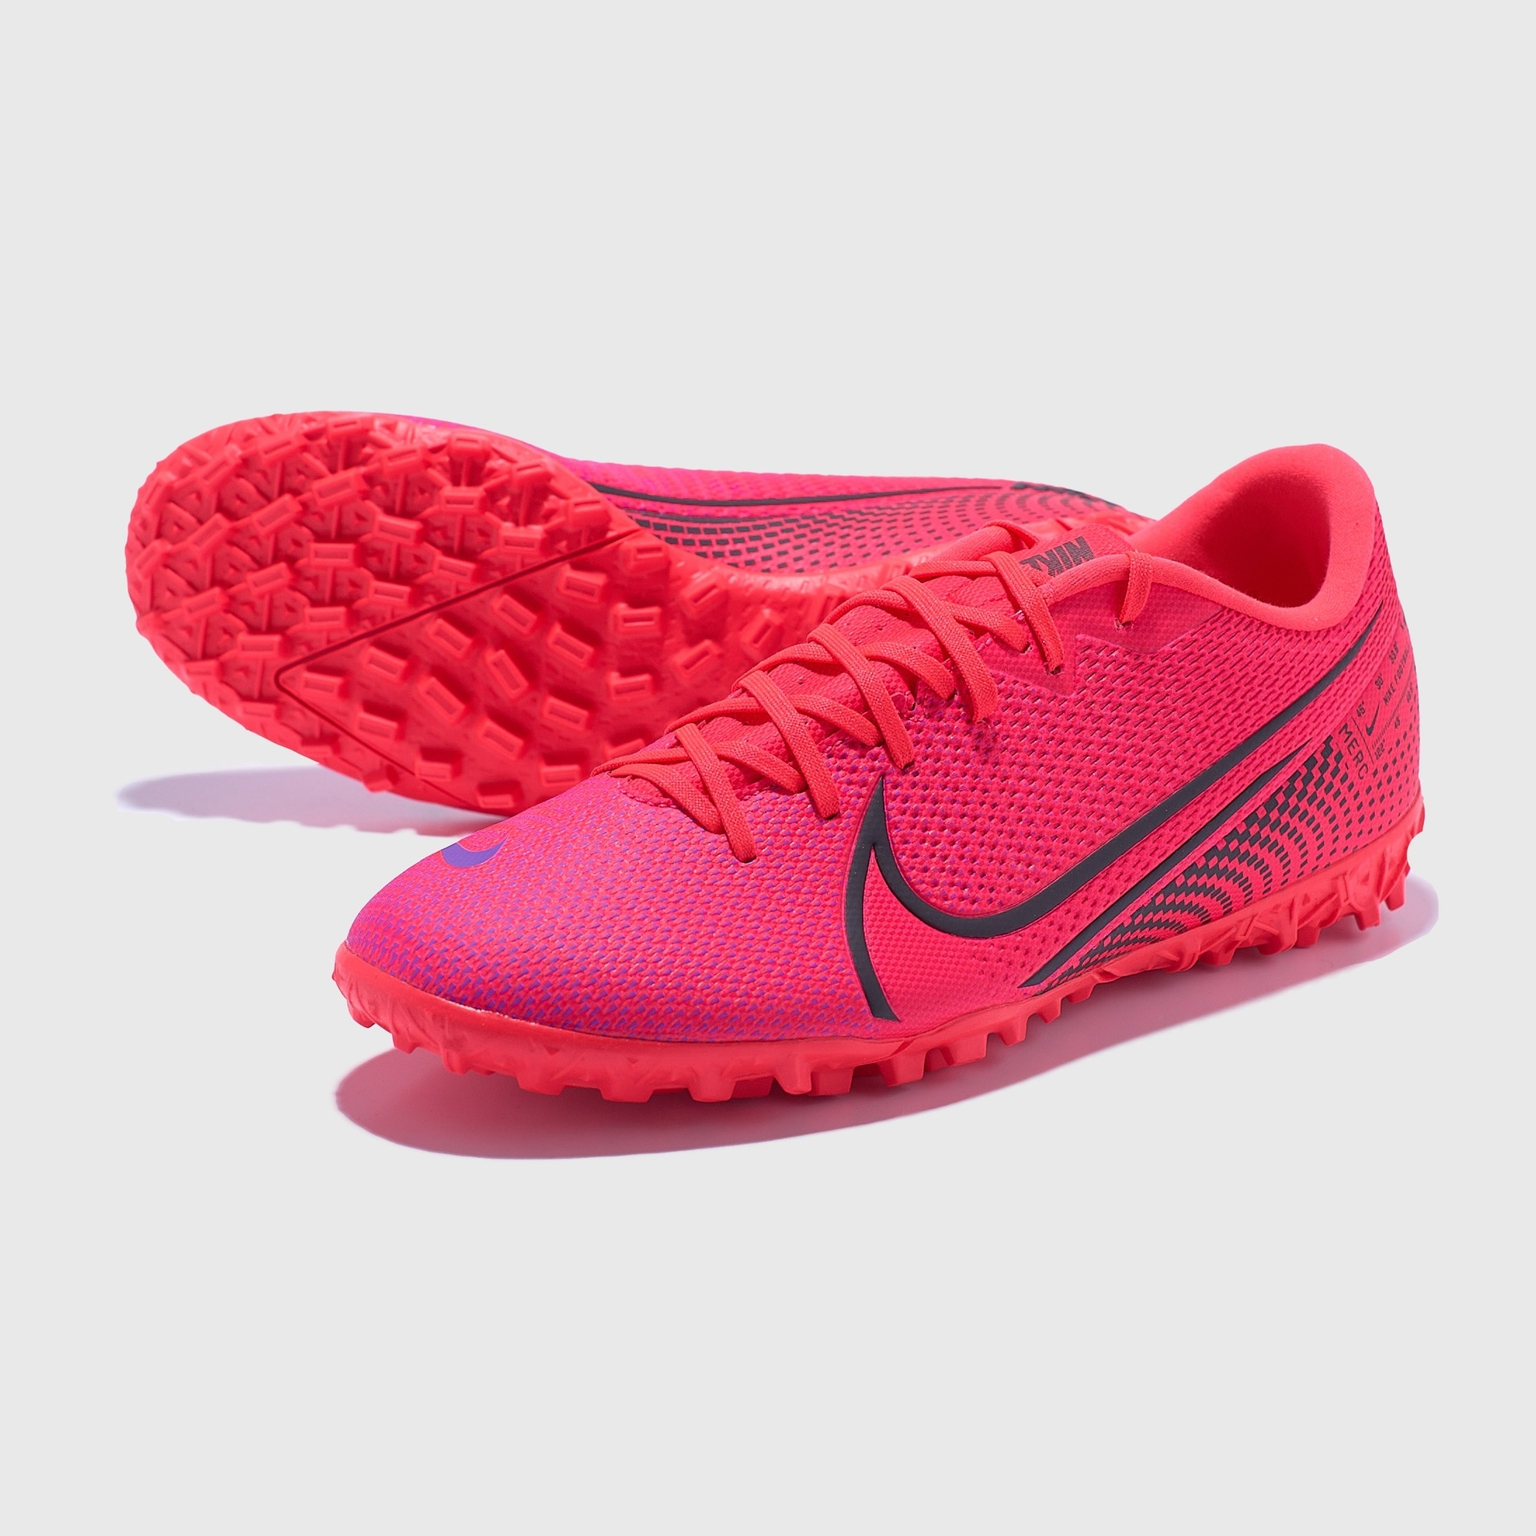 Фото - Шиповки Nike Vapor 13 Academy TF AT7996-606 шиповки детские nike vapor 13 academy neymar tf at8144 104